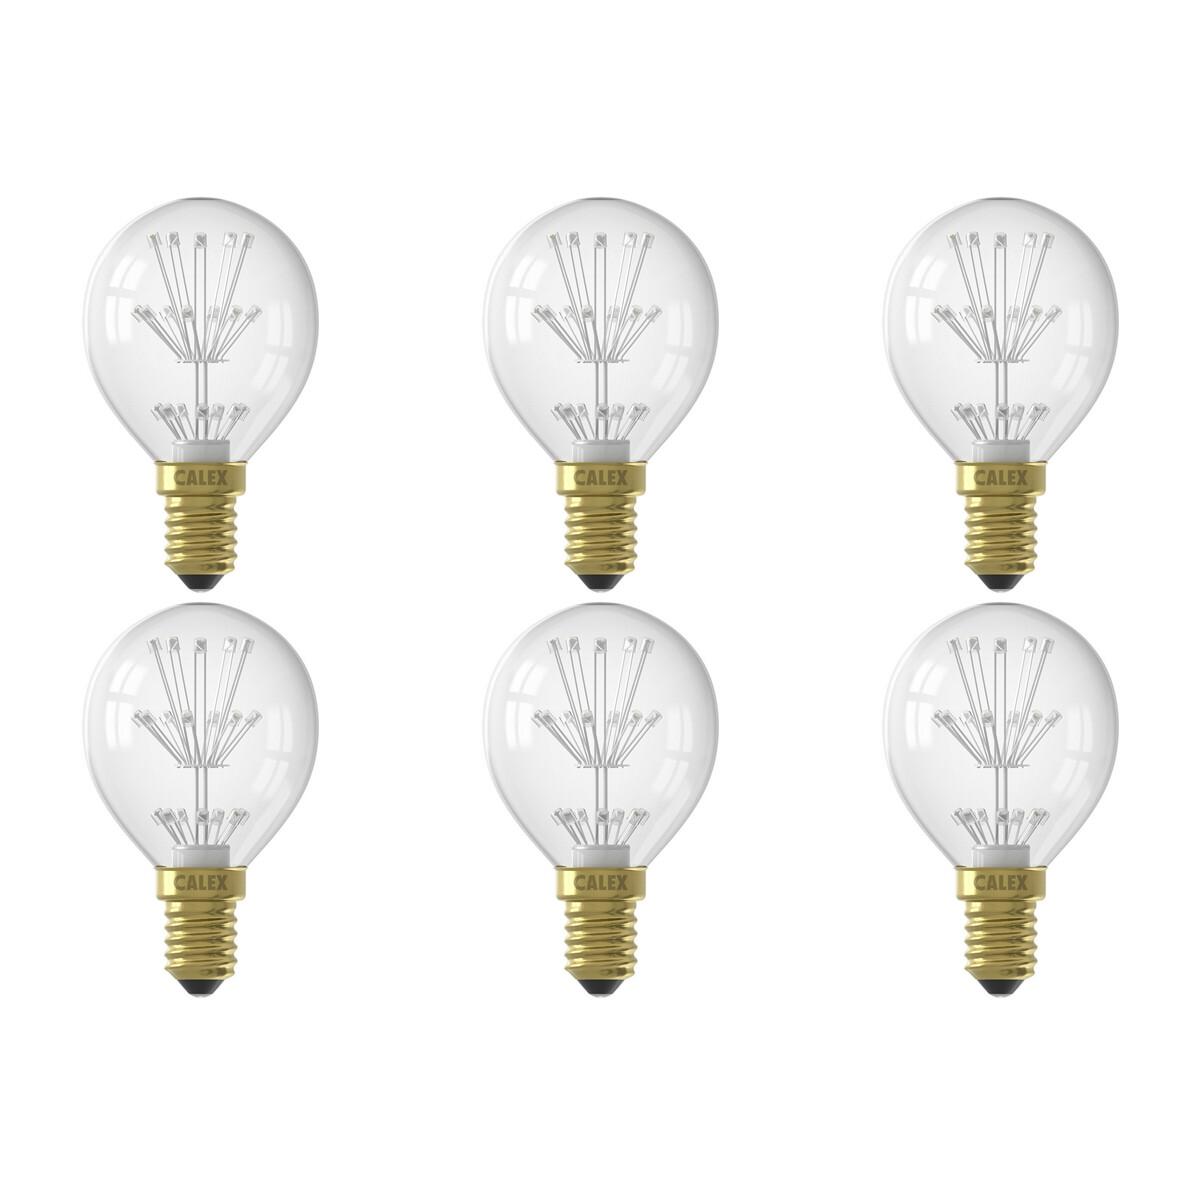 CALEX - LED Lamp 6 Pack - Kogellamp P45 - E14 Fitting - 1W - Warm Wit 2100K - Transparant Helder